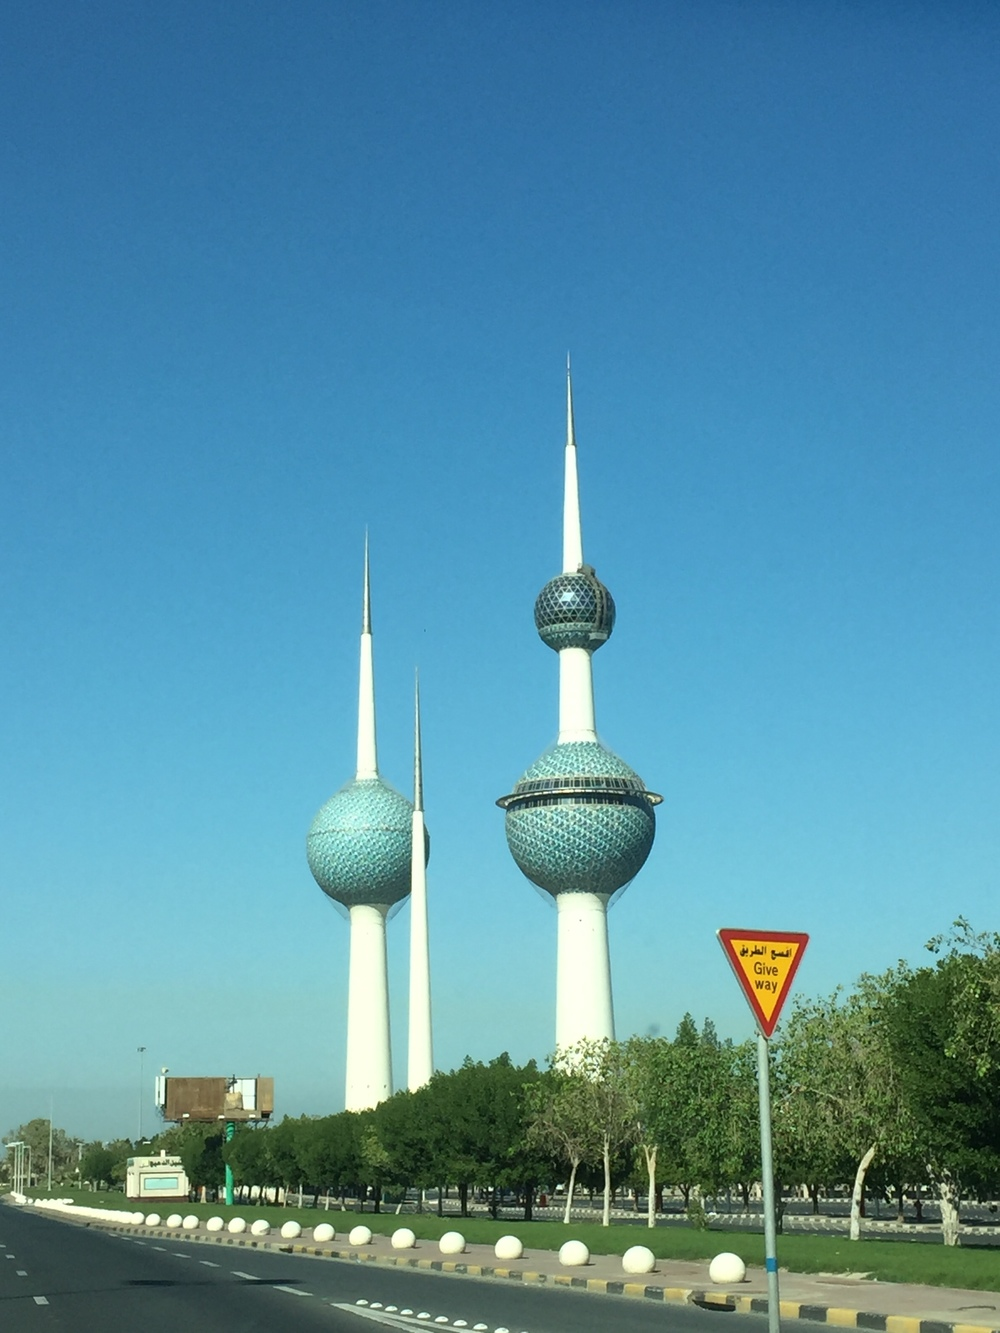 Image by Anna Maria Sandegren, Kuwait Towers